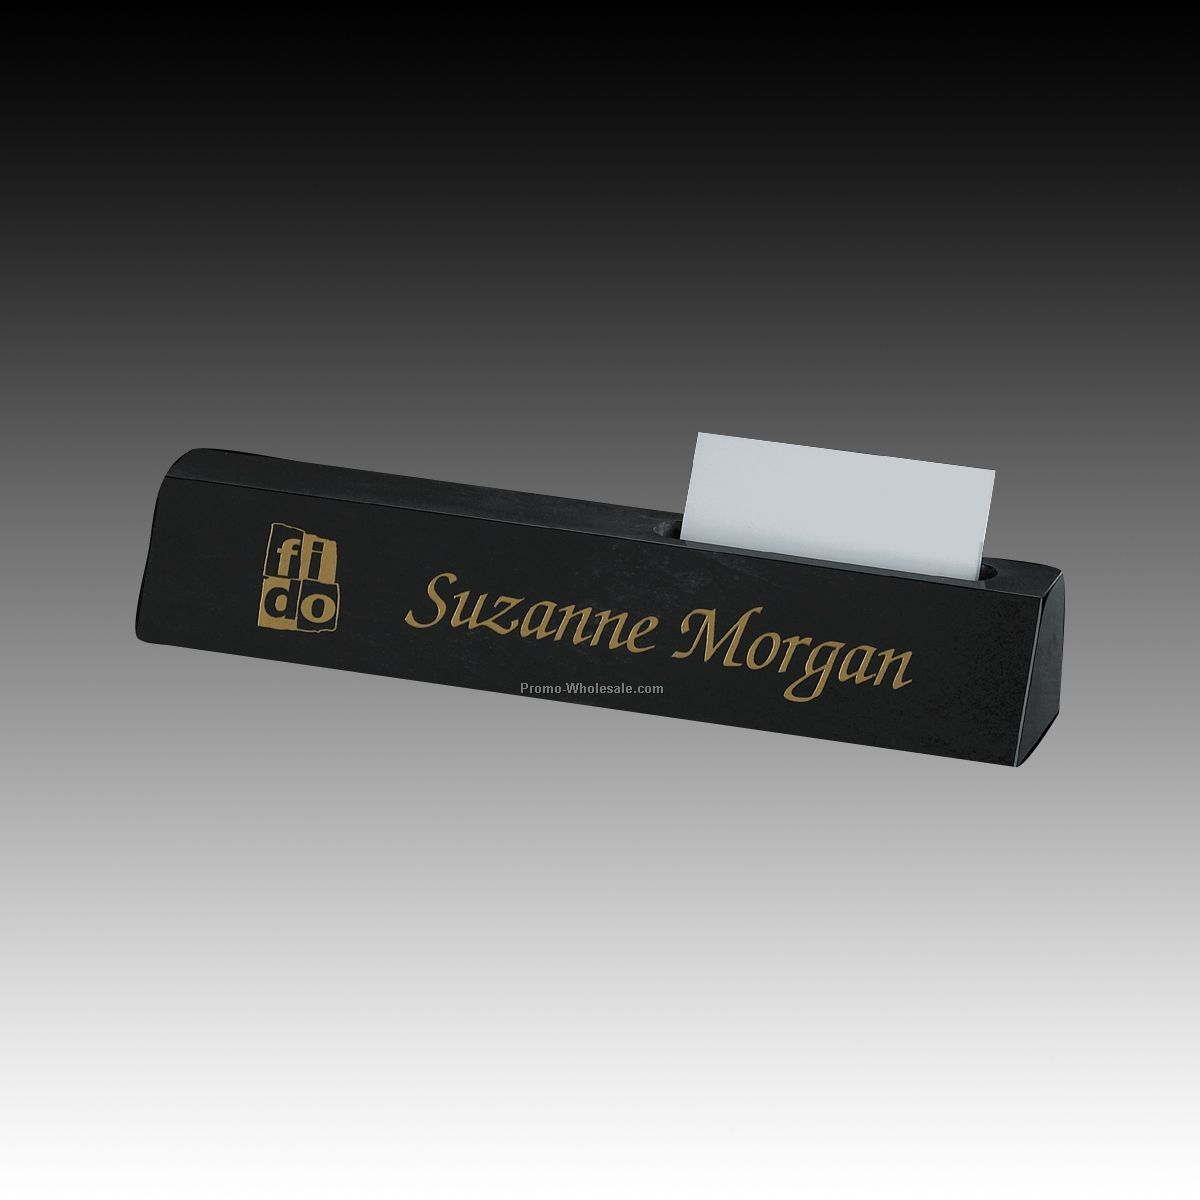 Name plateschina wholesale name platespage5 10 12 black genuine marble nameplate wcardholder colourmoves